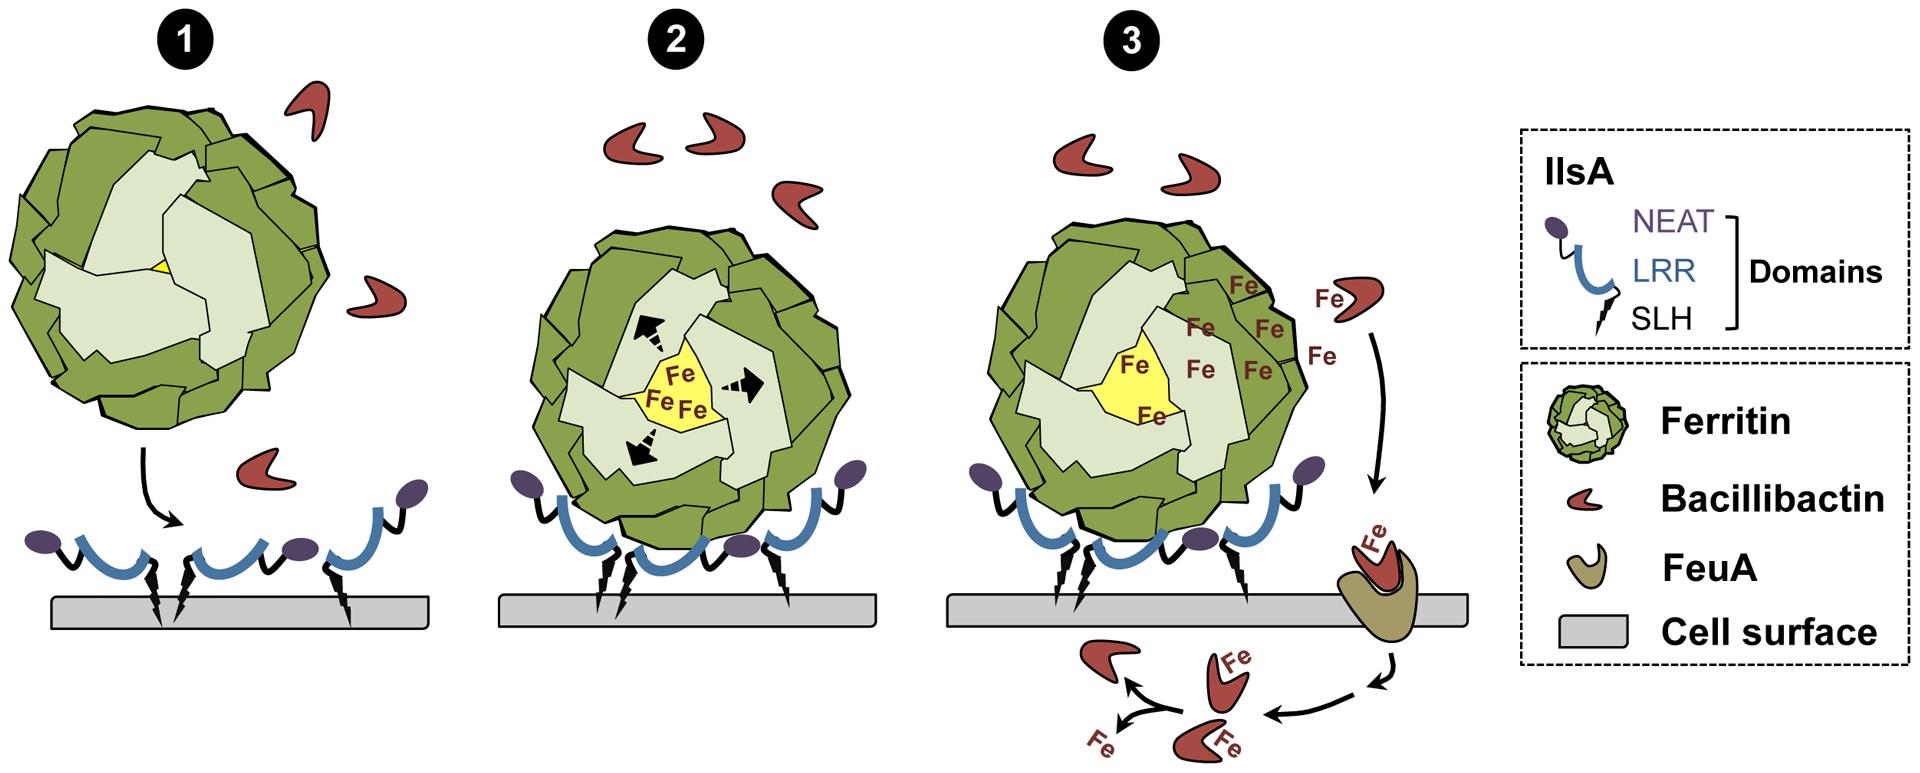 Schematic representation of iron uptake from ferritin in <i>B. cereus</i>.